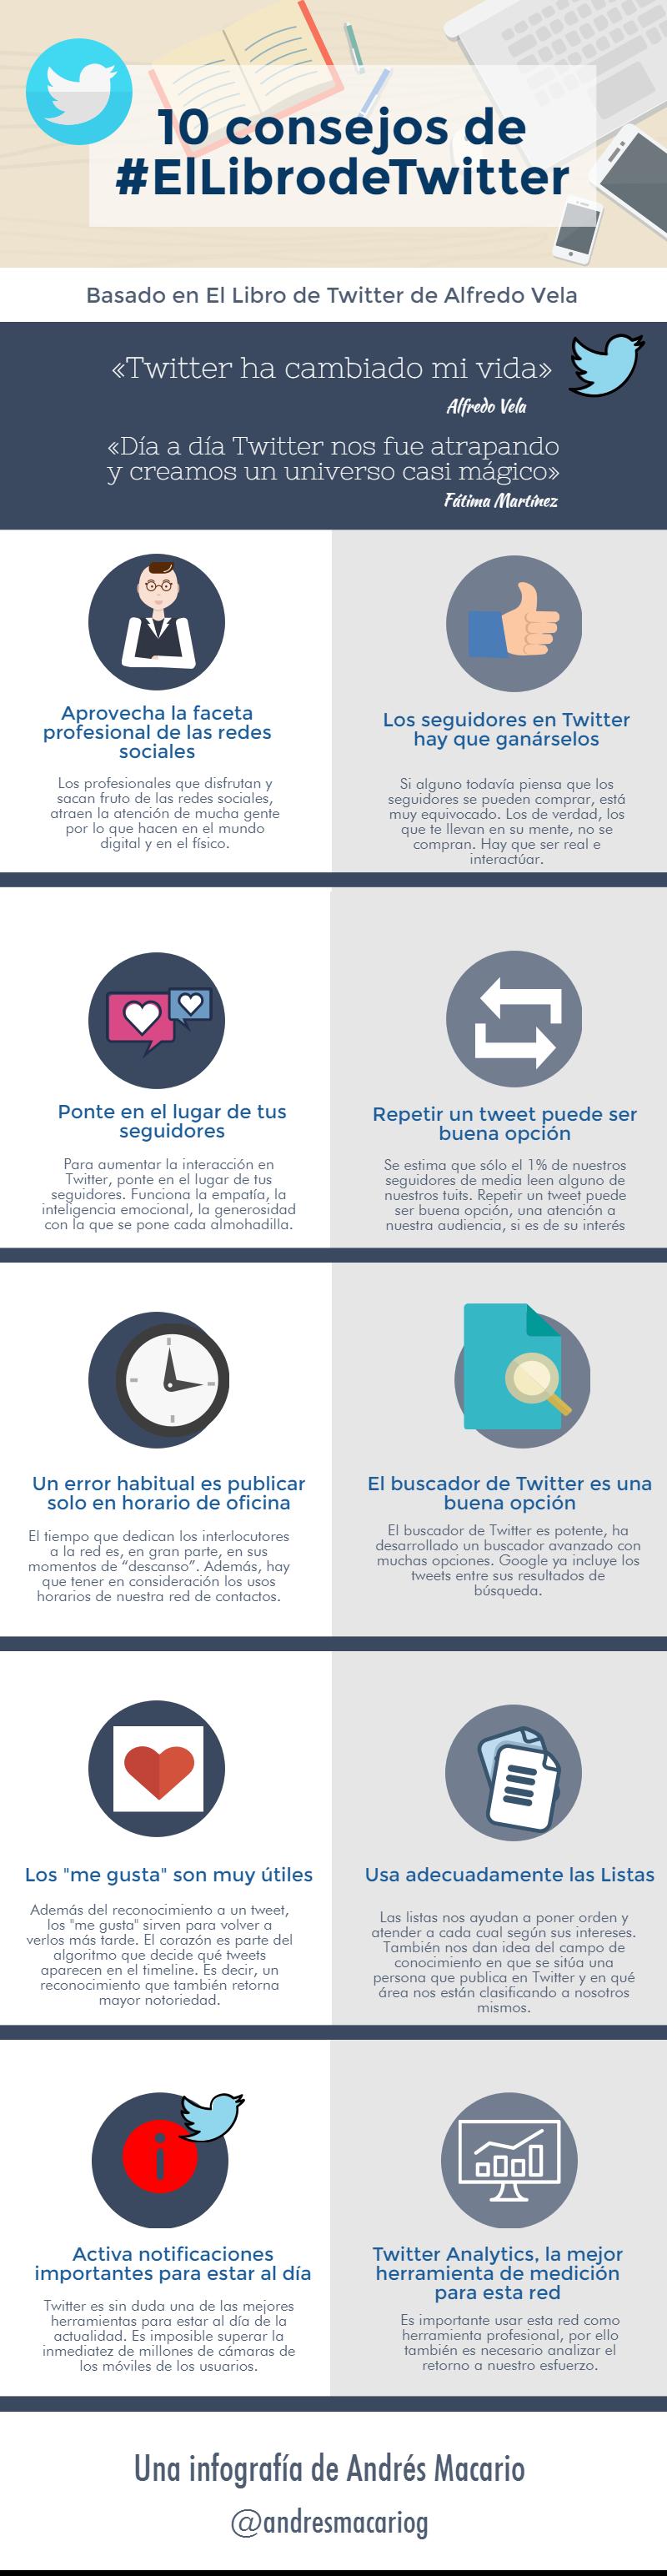 10-consejos-sobre-el-libro-de-twitter-infografia-andres-macario